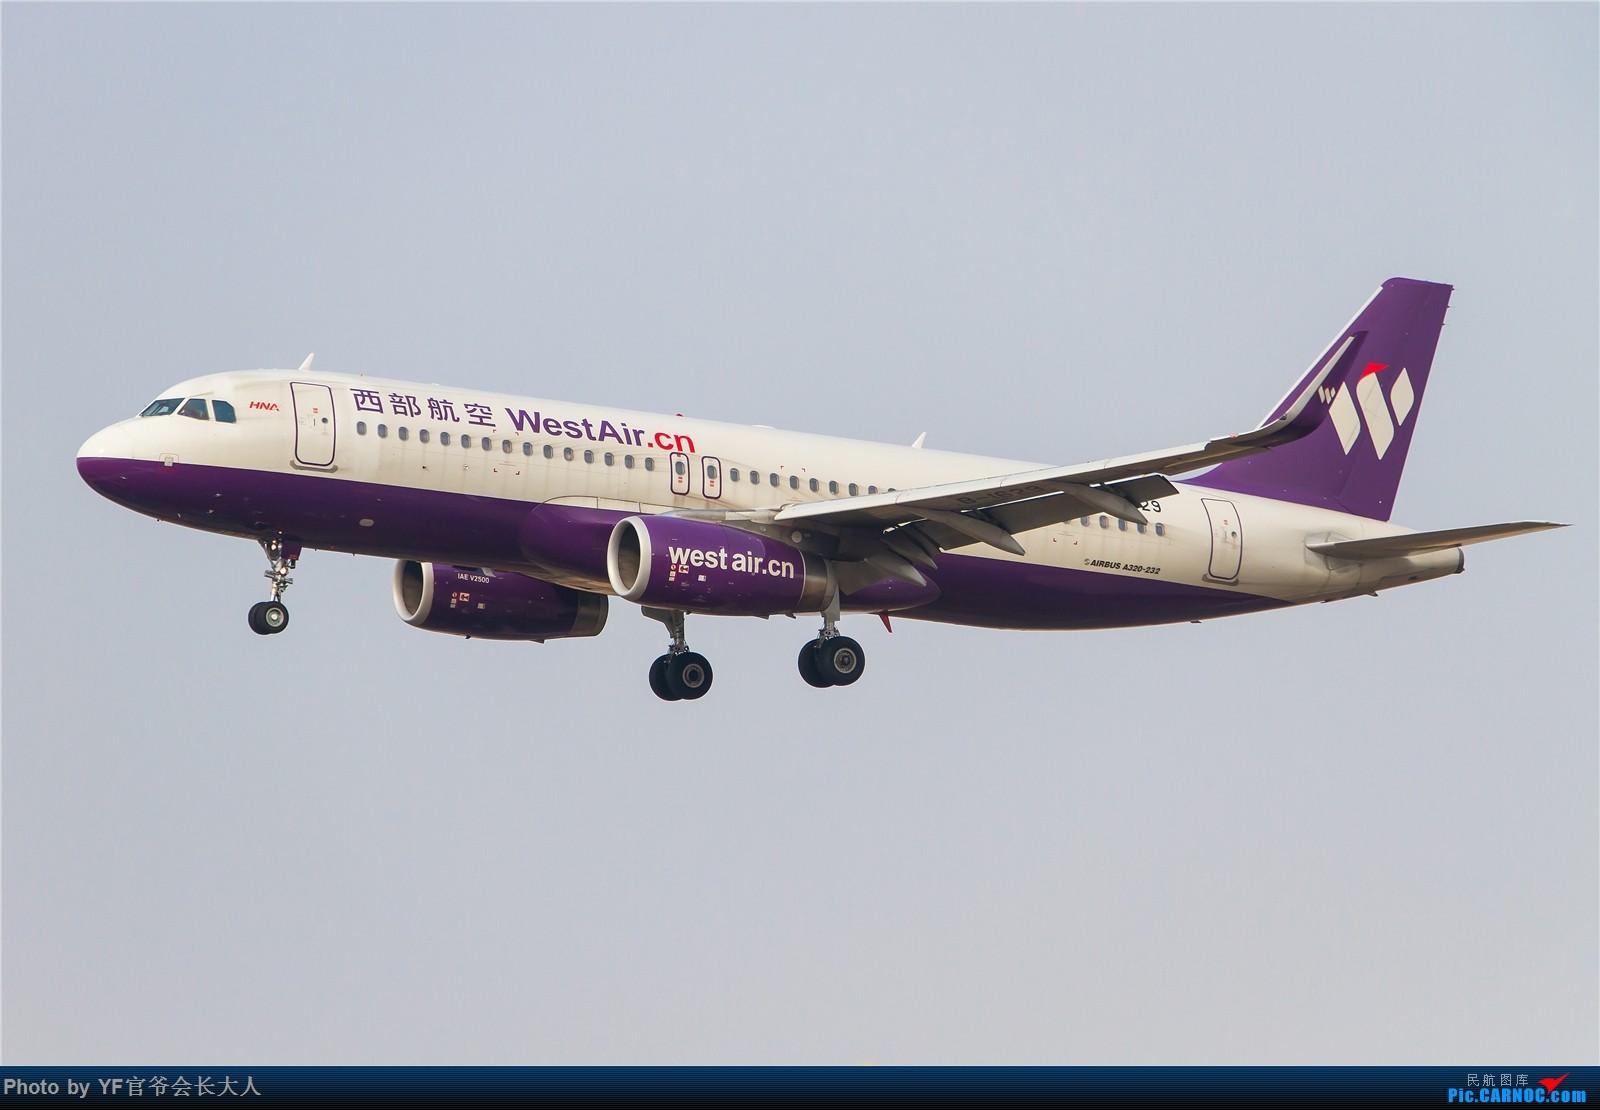 Re:[原创]【ZYTX】【1600*1066】论坛首发:俄罗斯艾菲航空公司波音757-28A,注册号:EI-EWT,还有757斯基以及最近新拍机点拍的一些好货 AIRBUS A320-200 B-1629 中国沈阳桃仙国际机场